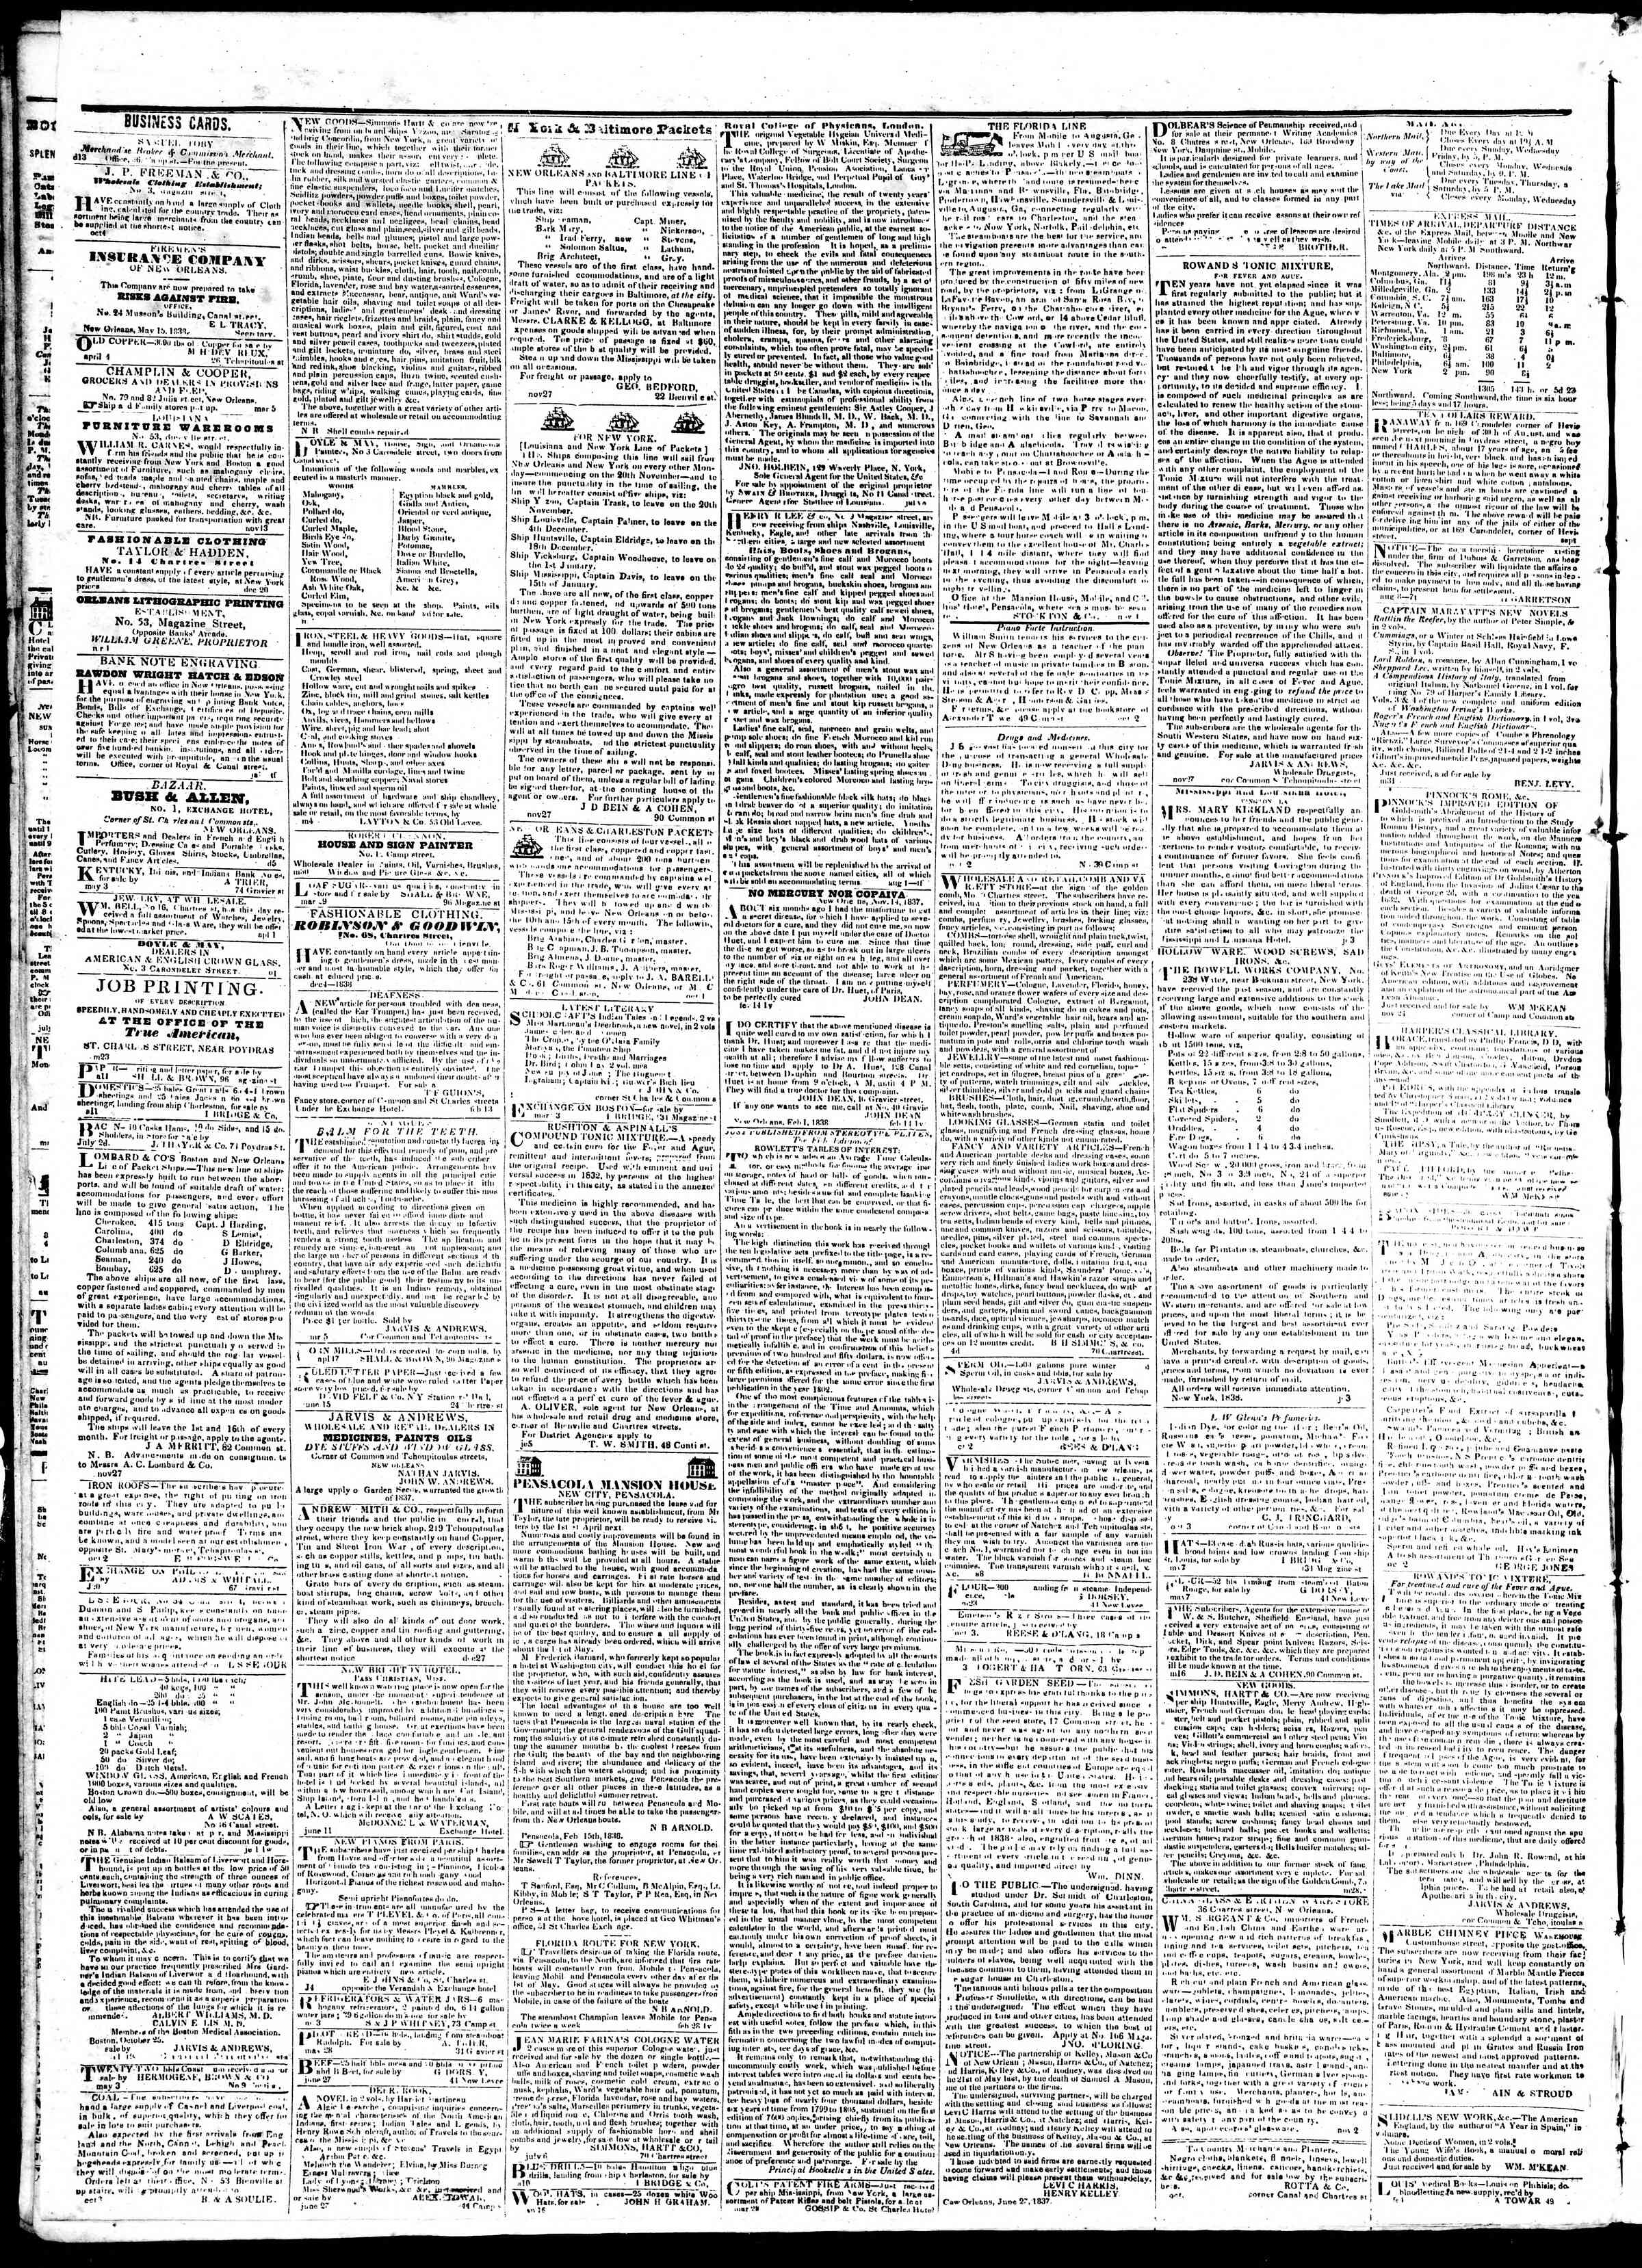 August 27, 1839 Tarihli True American Gazetesi Sayfa 4